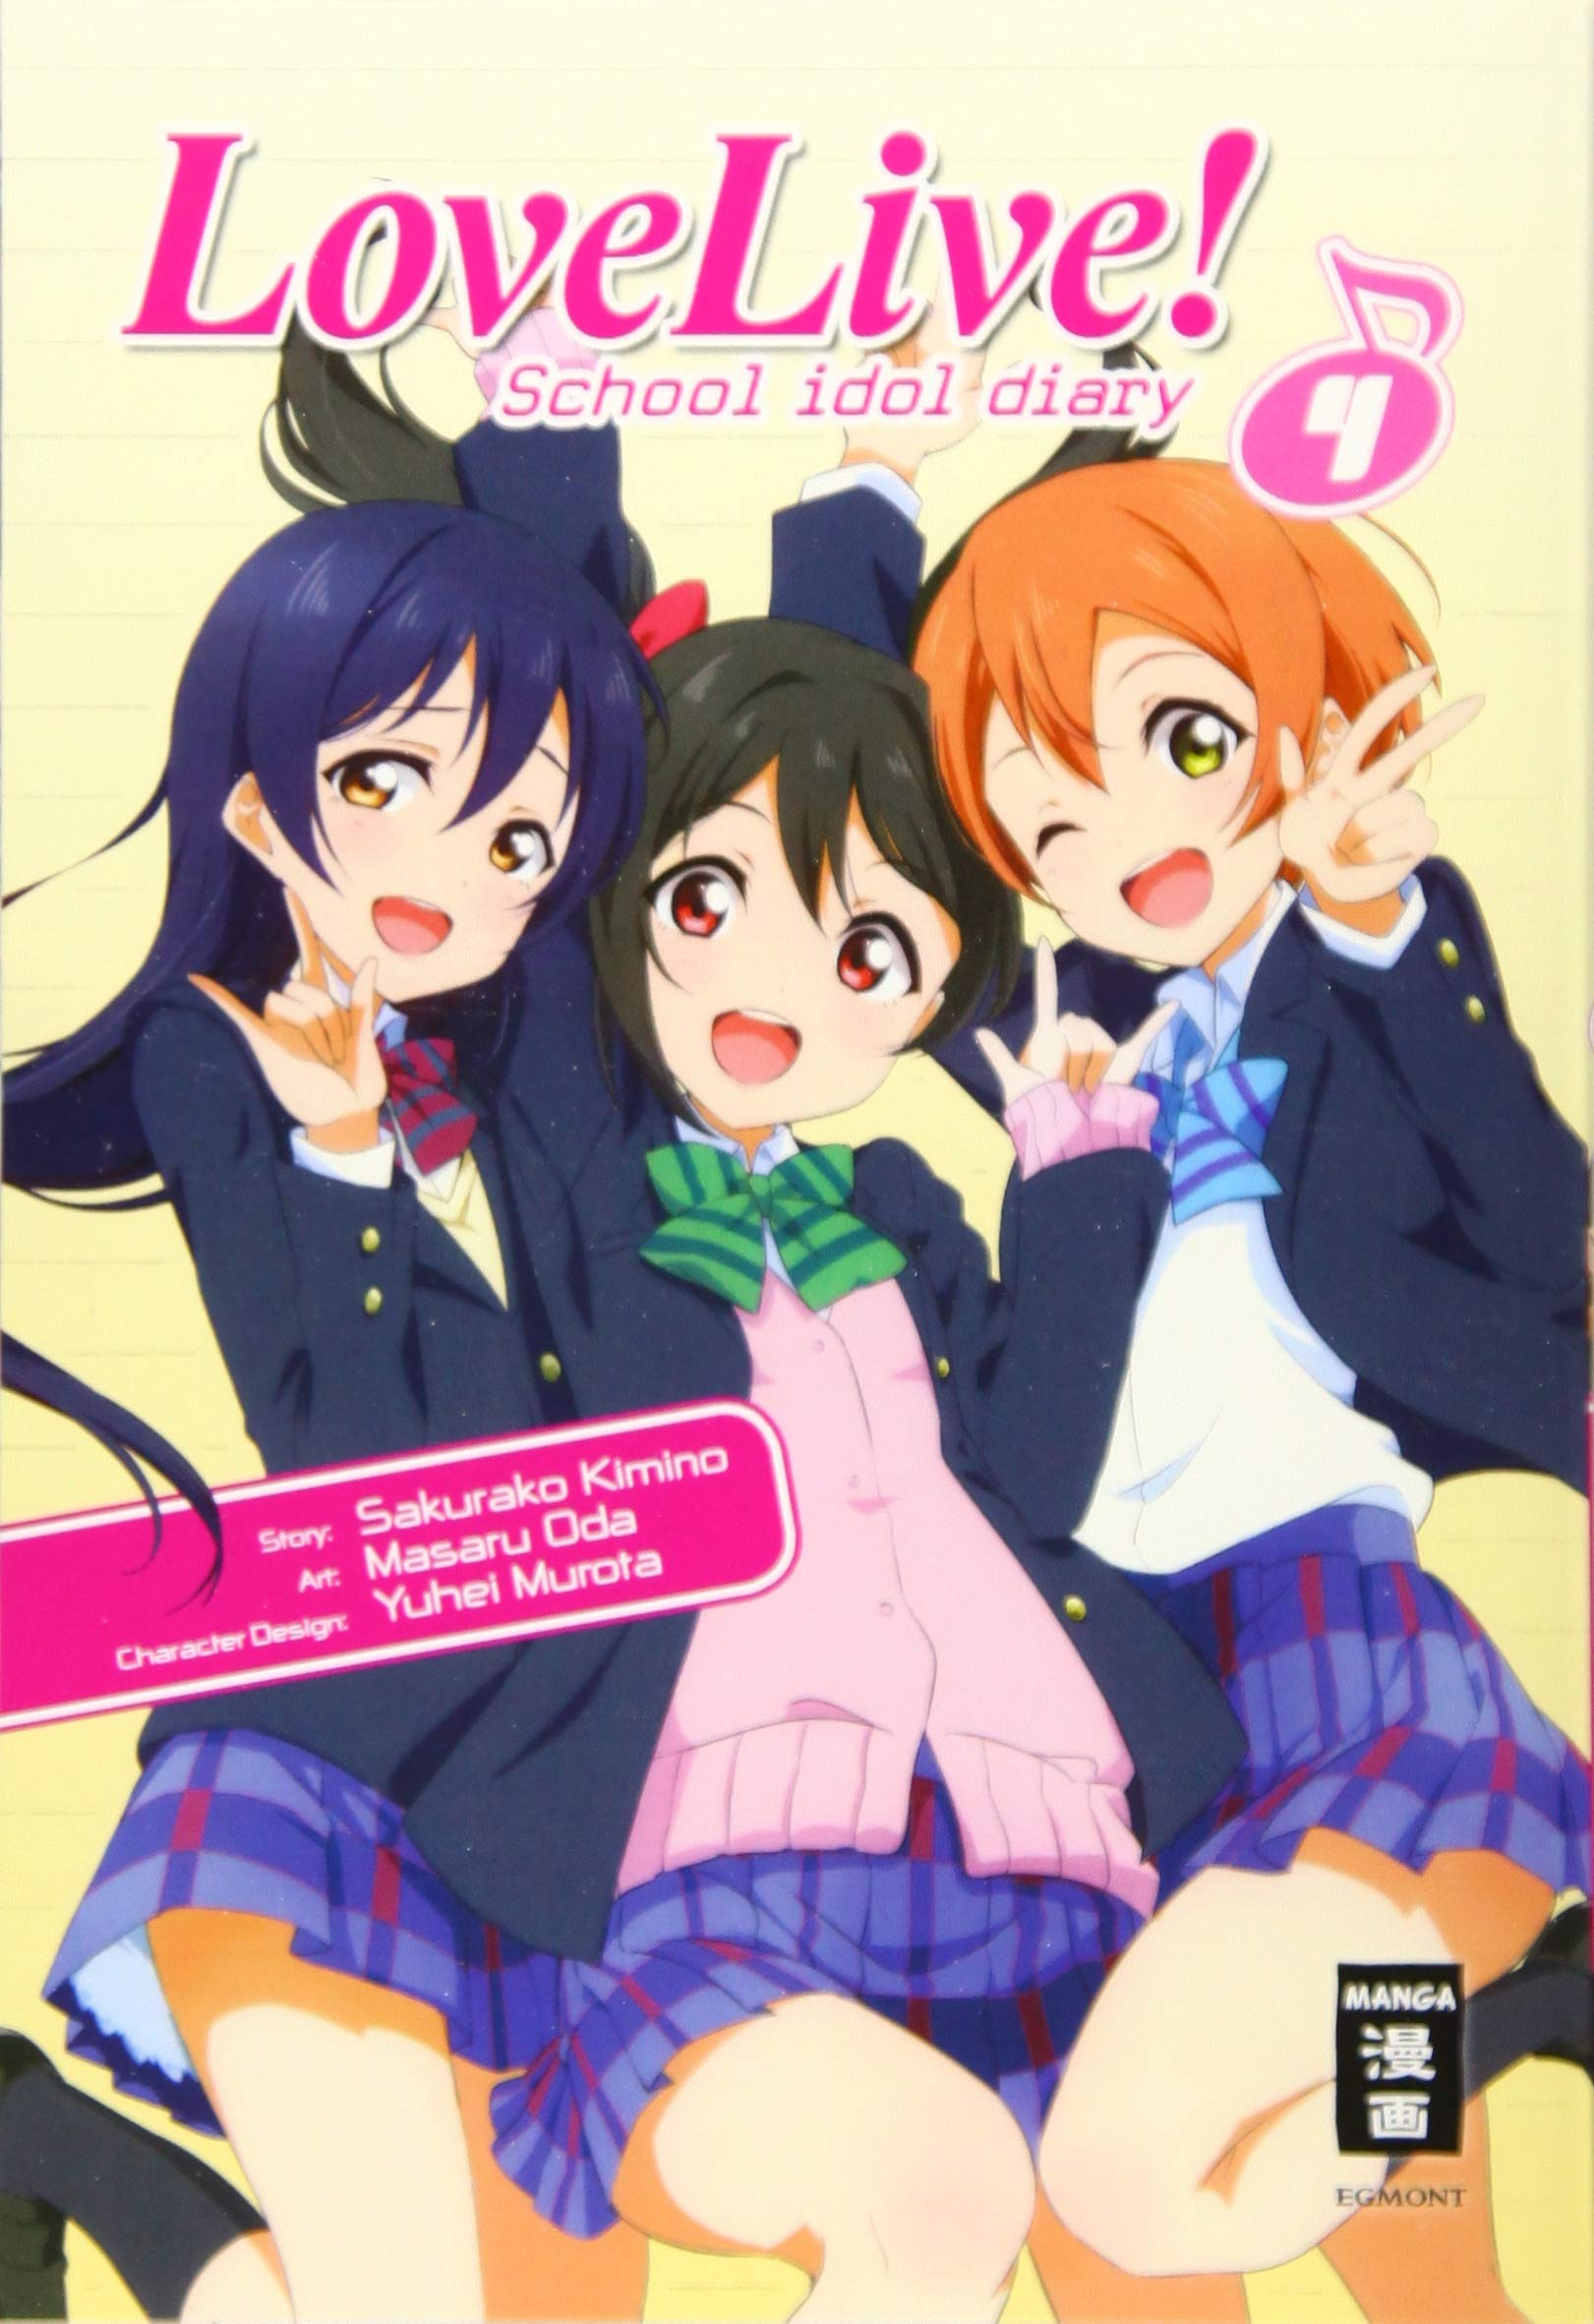 Love Live School idol diary Nozomi Toujou illustration art book